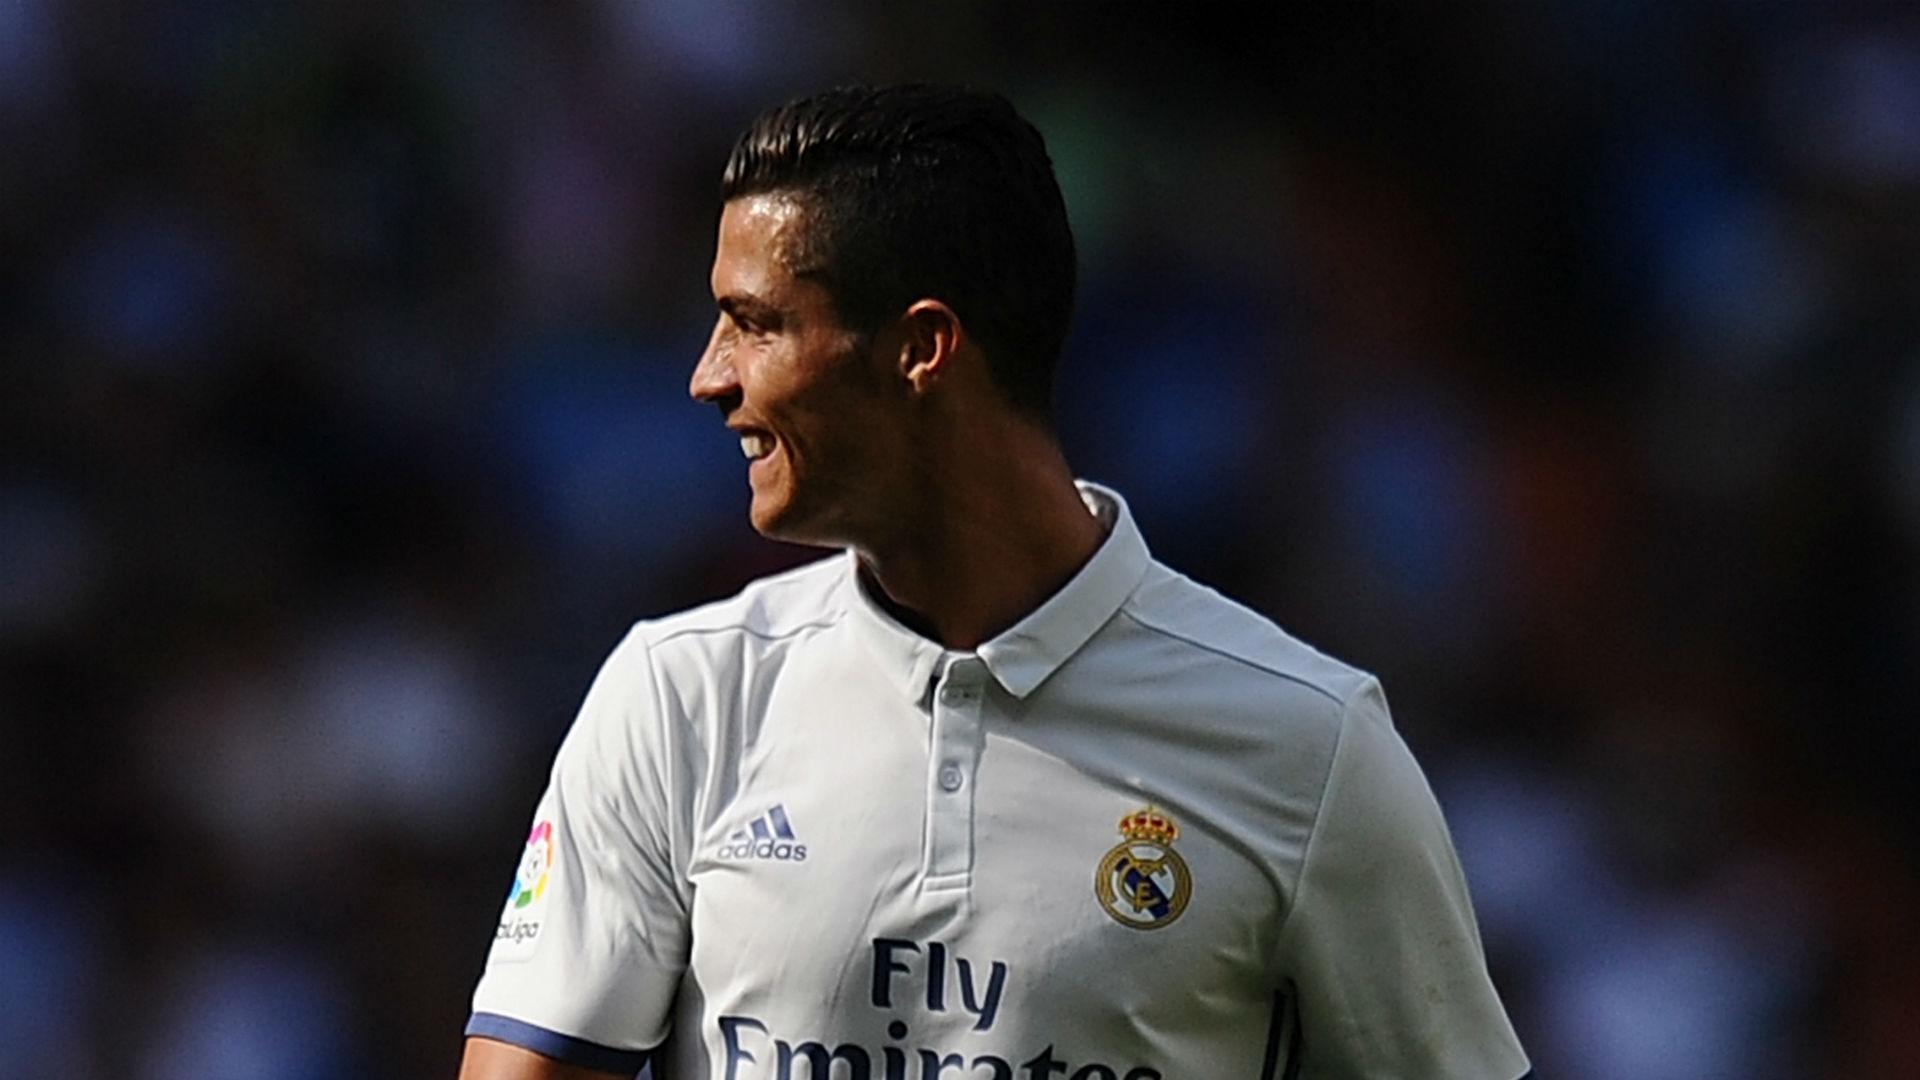 Madrid can retain Champions League - Ronaldo